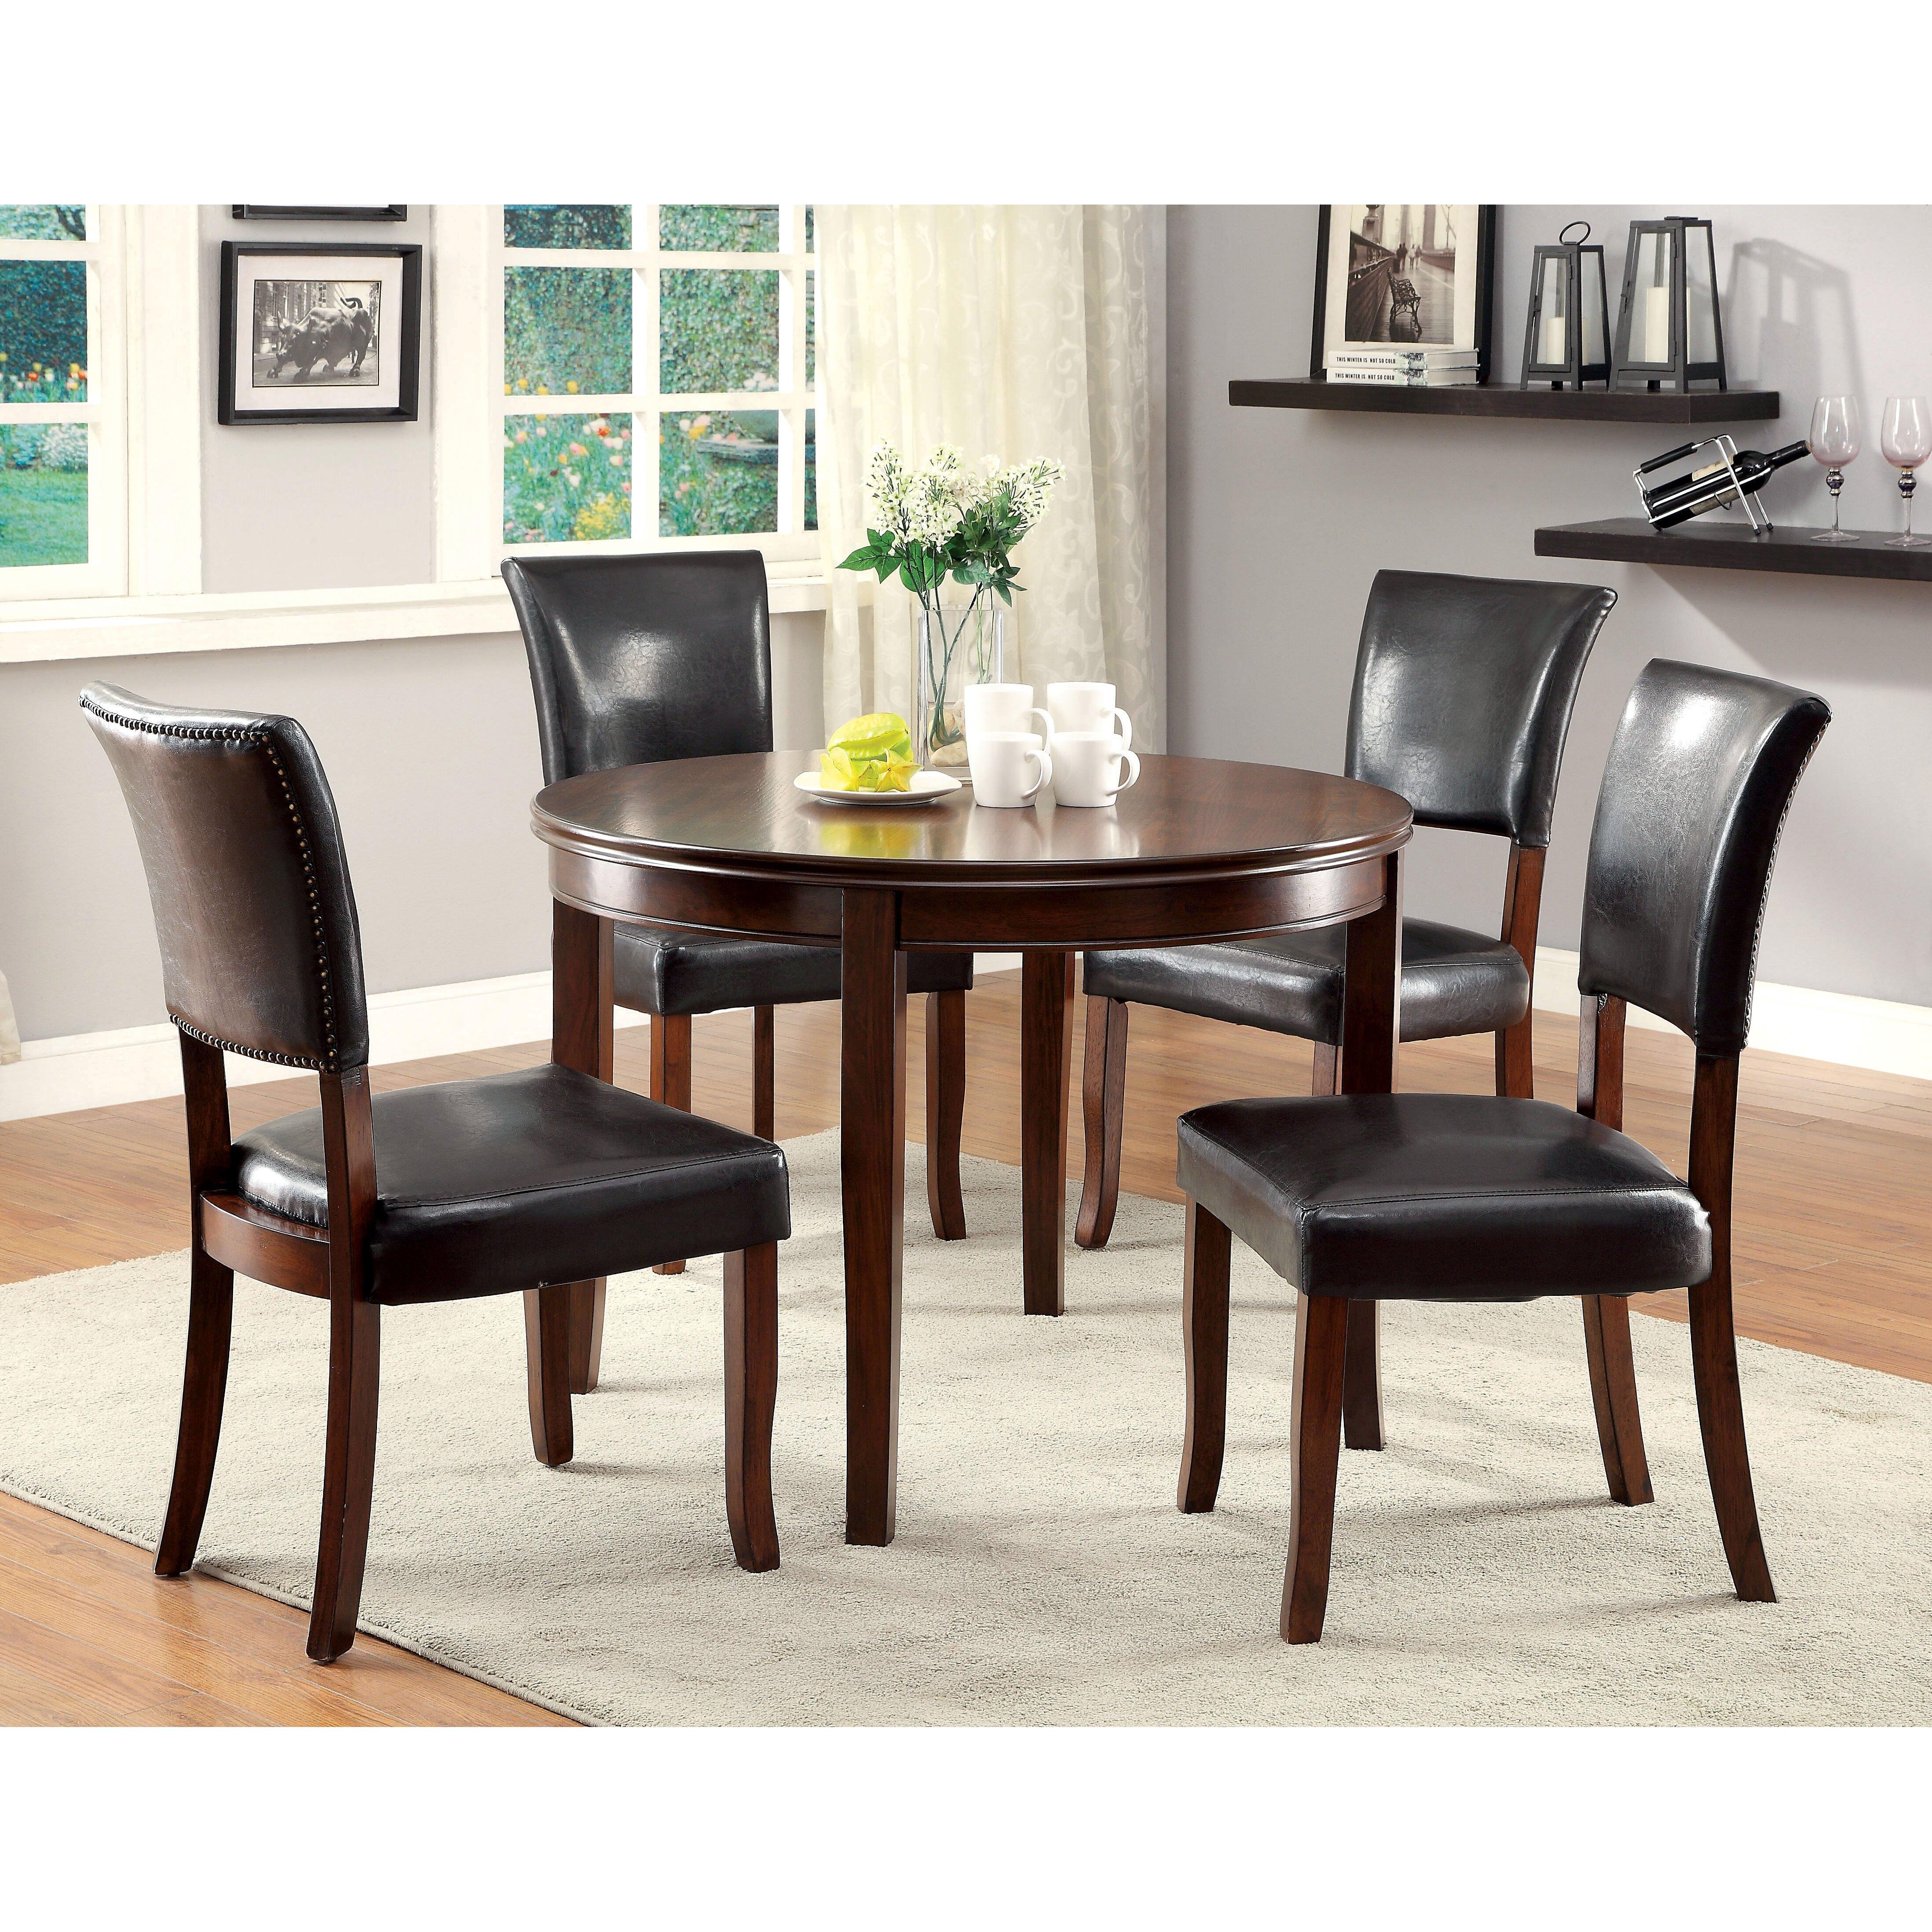 Hokku designs gabriel side chair for Hokku designs dining room furniture